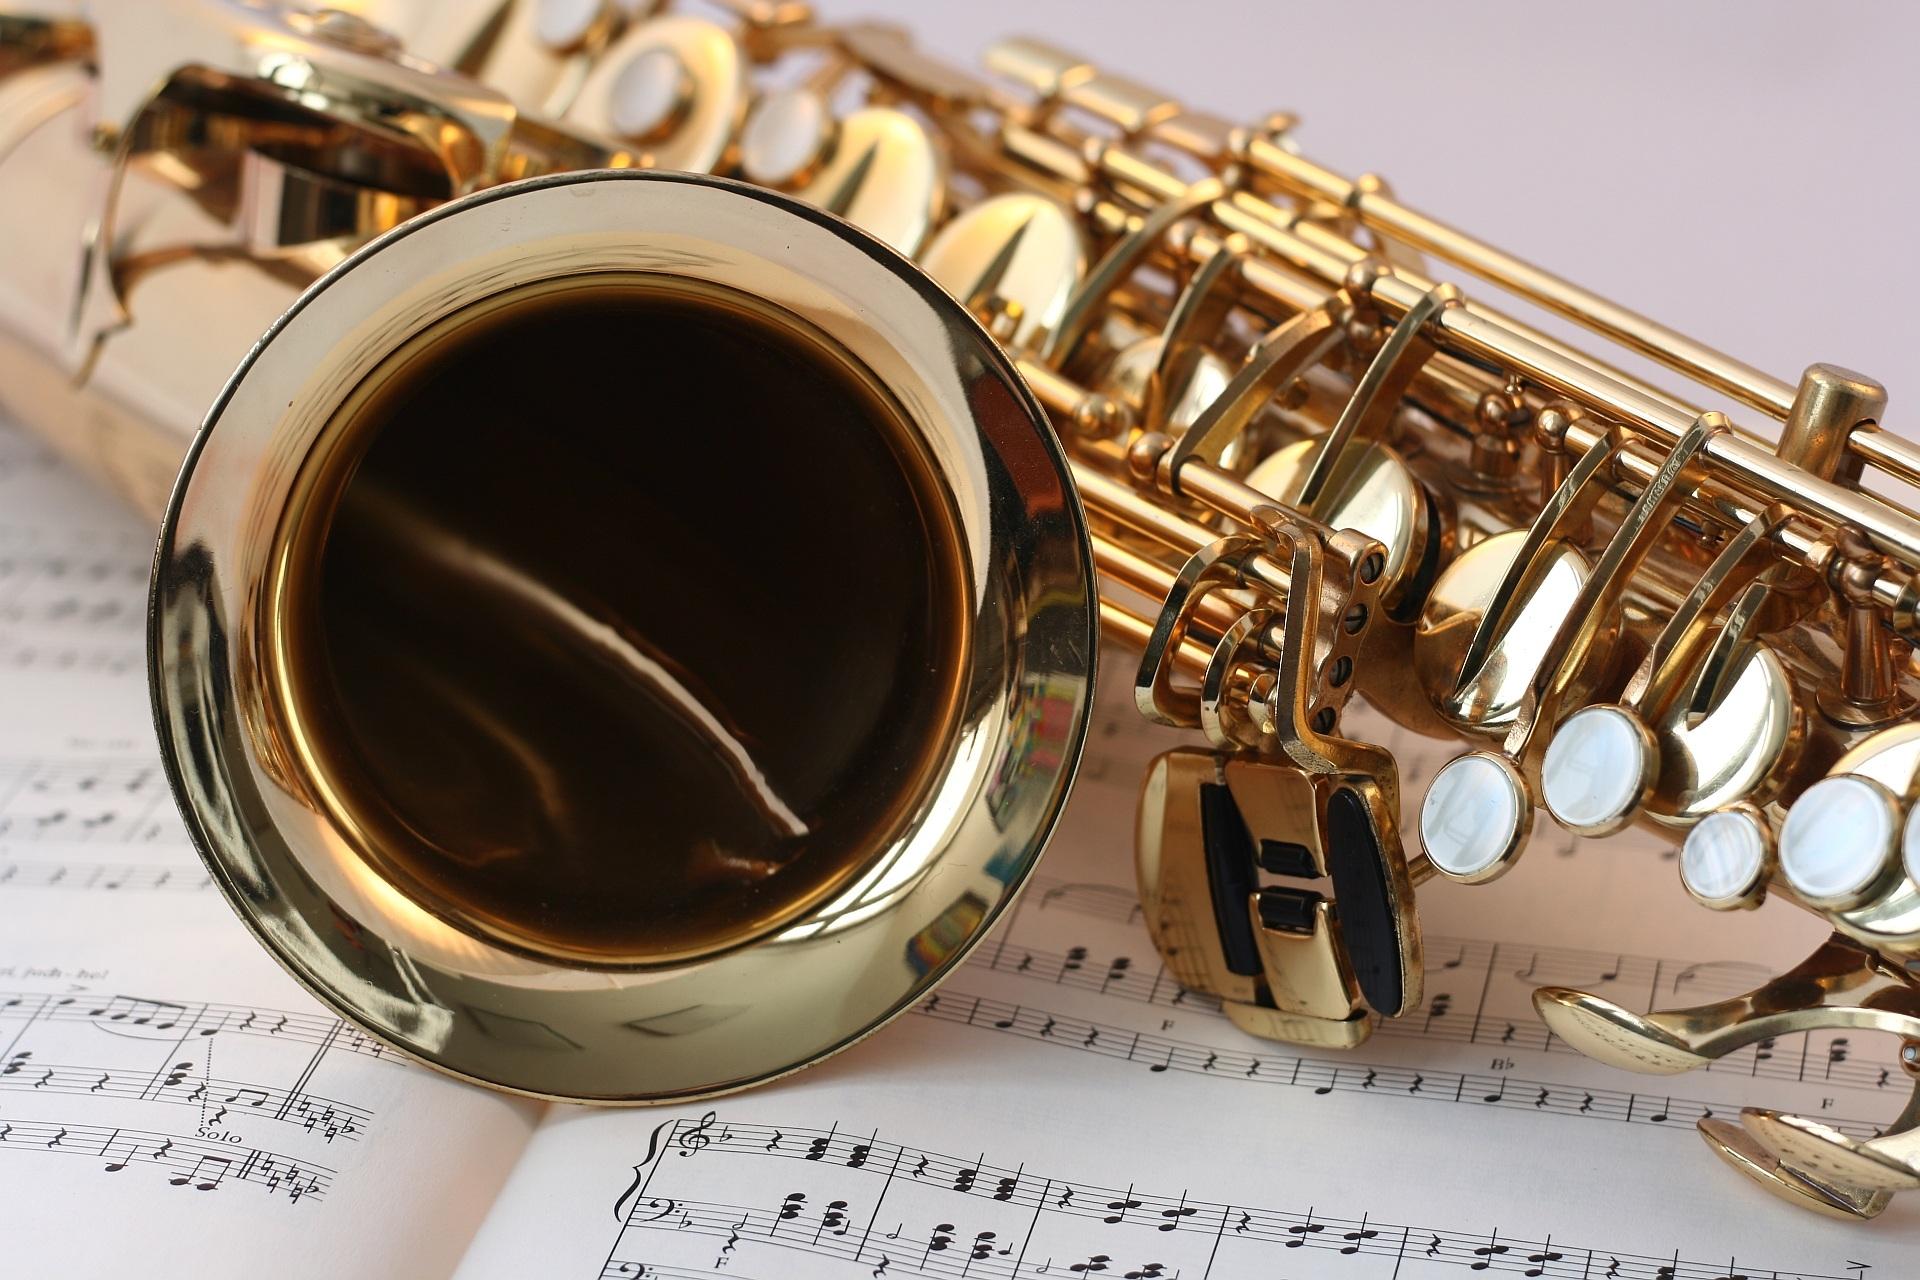 saxophone music desktop hd wallpaper 63174